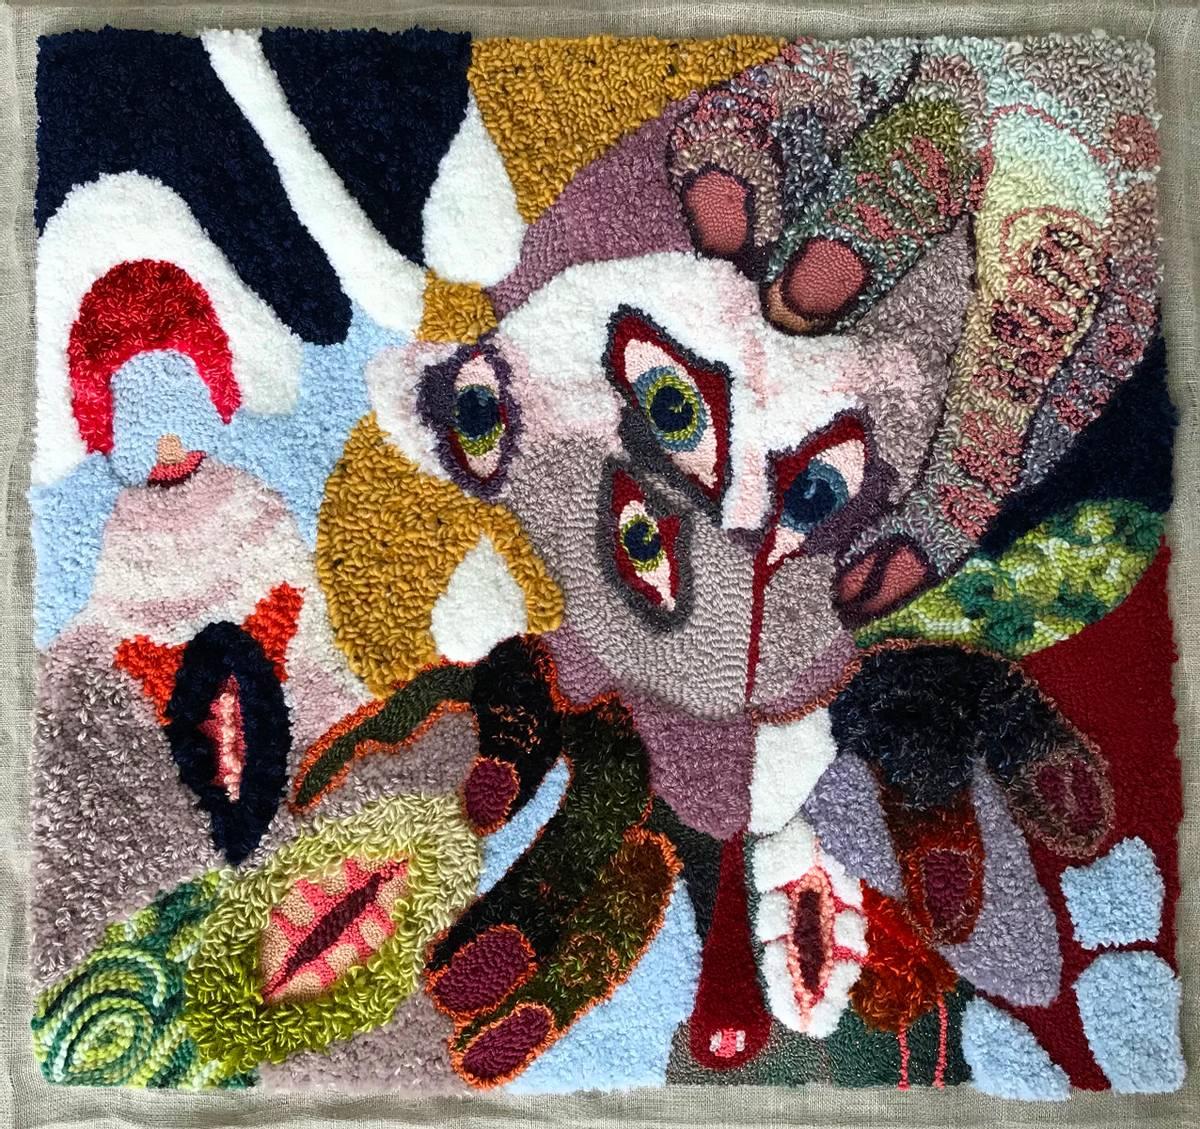 female work no. 2                  , Therese Myran